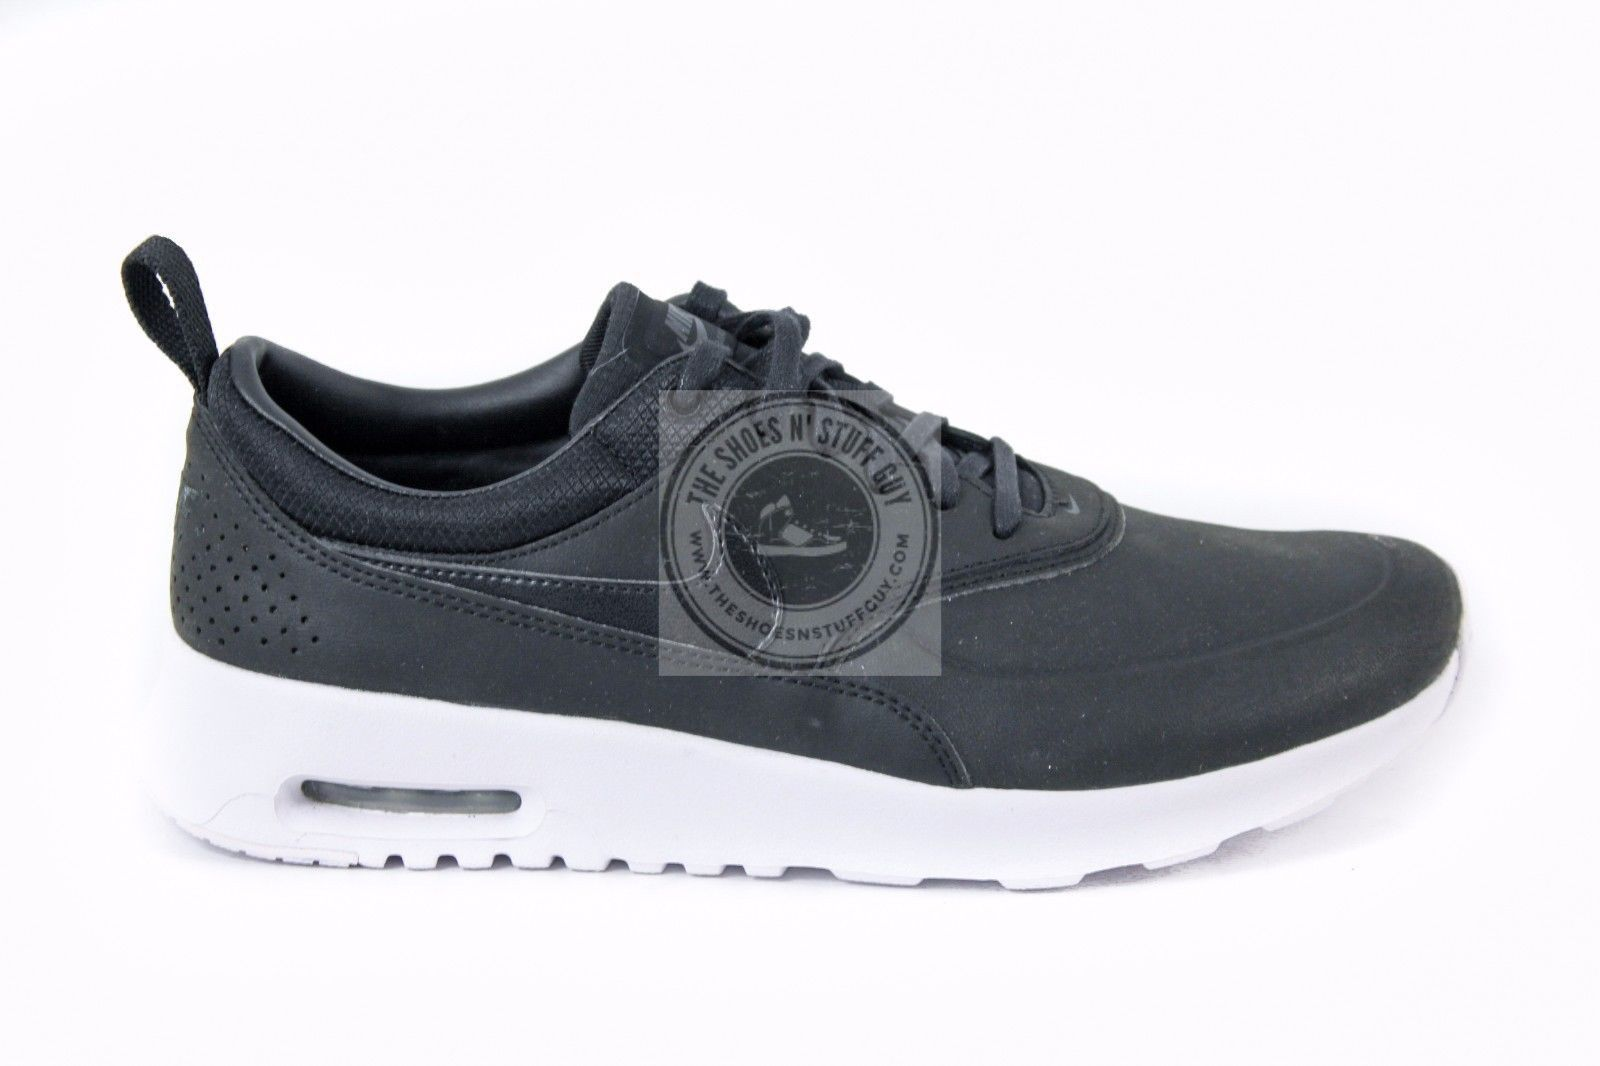 New Women S Nike Air Max Thea Prm 616723 007 Black White Size 9